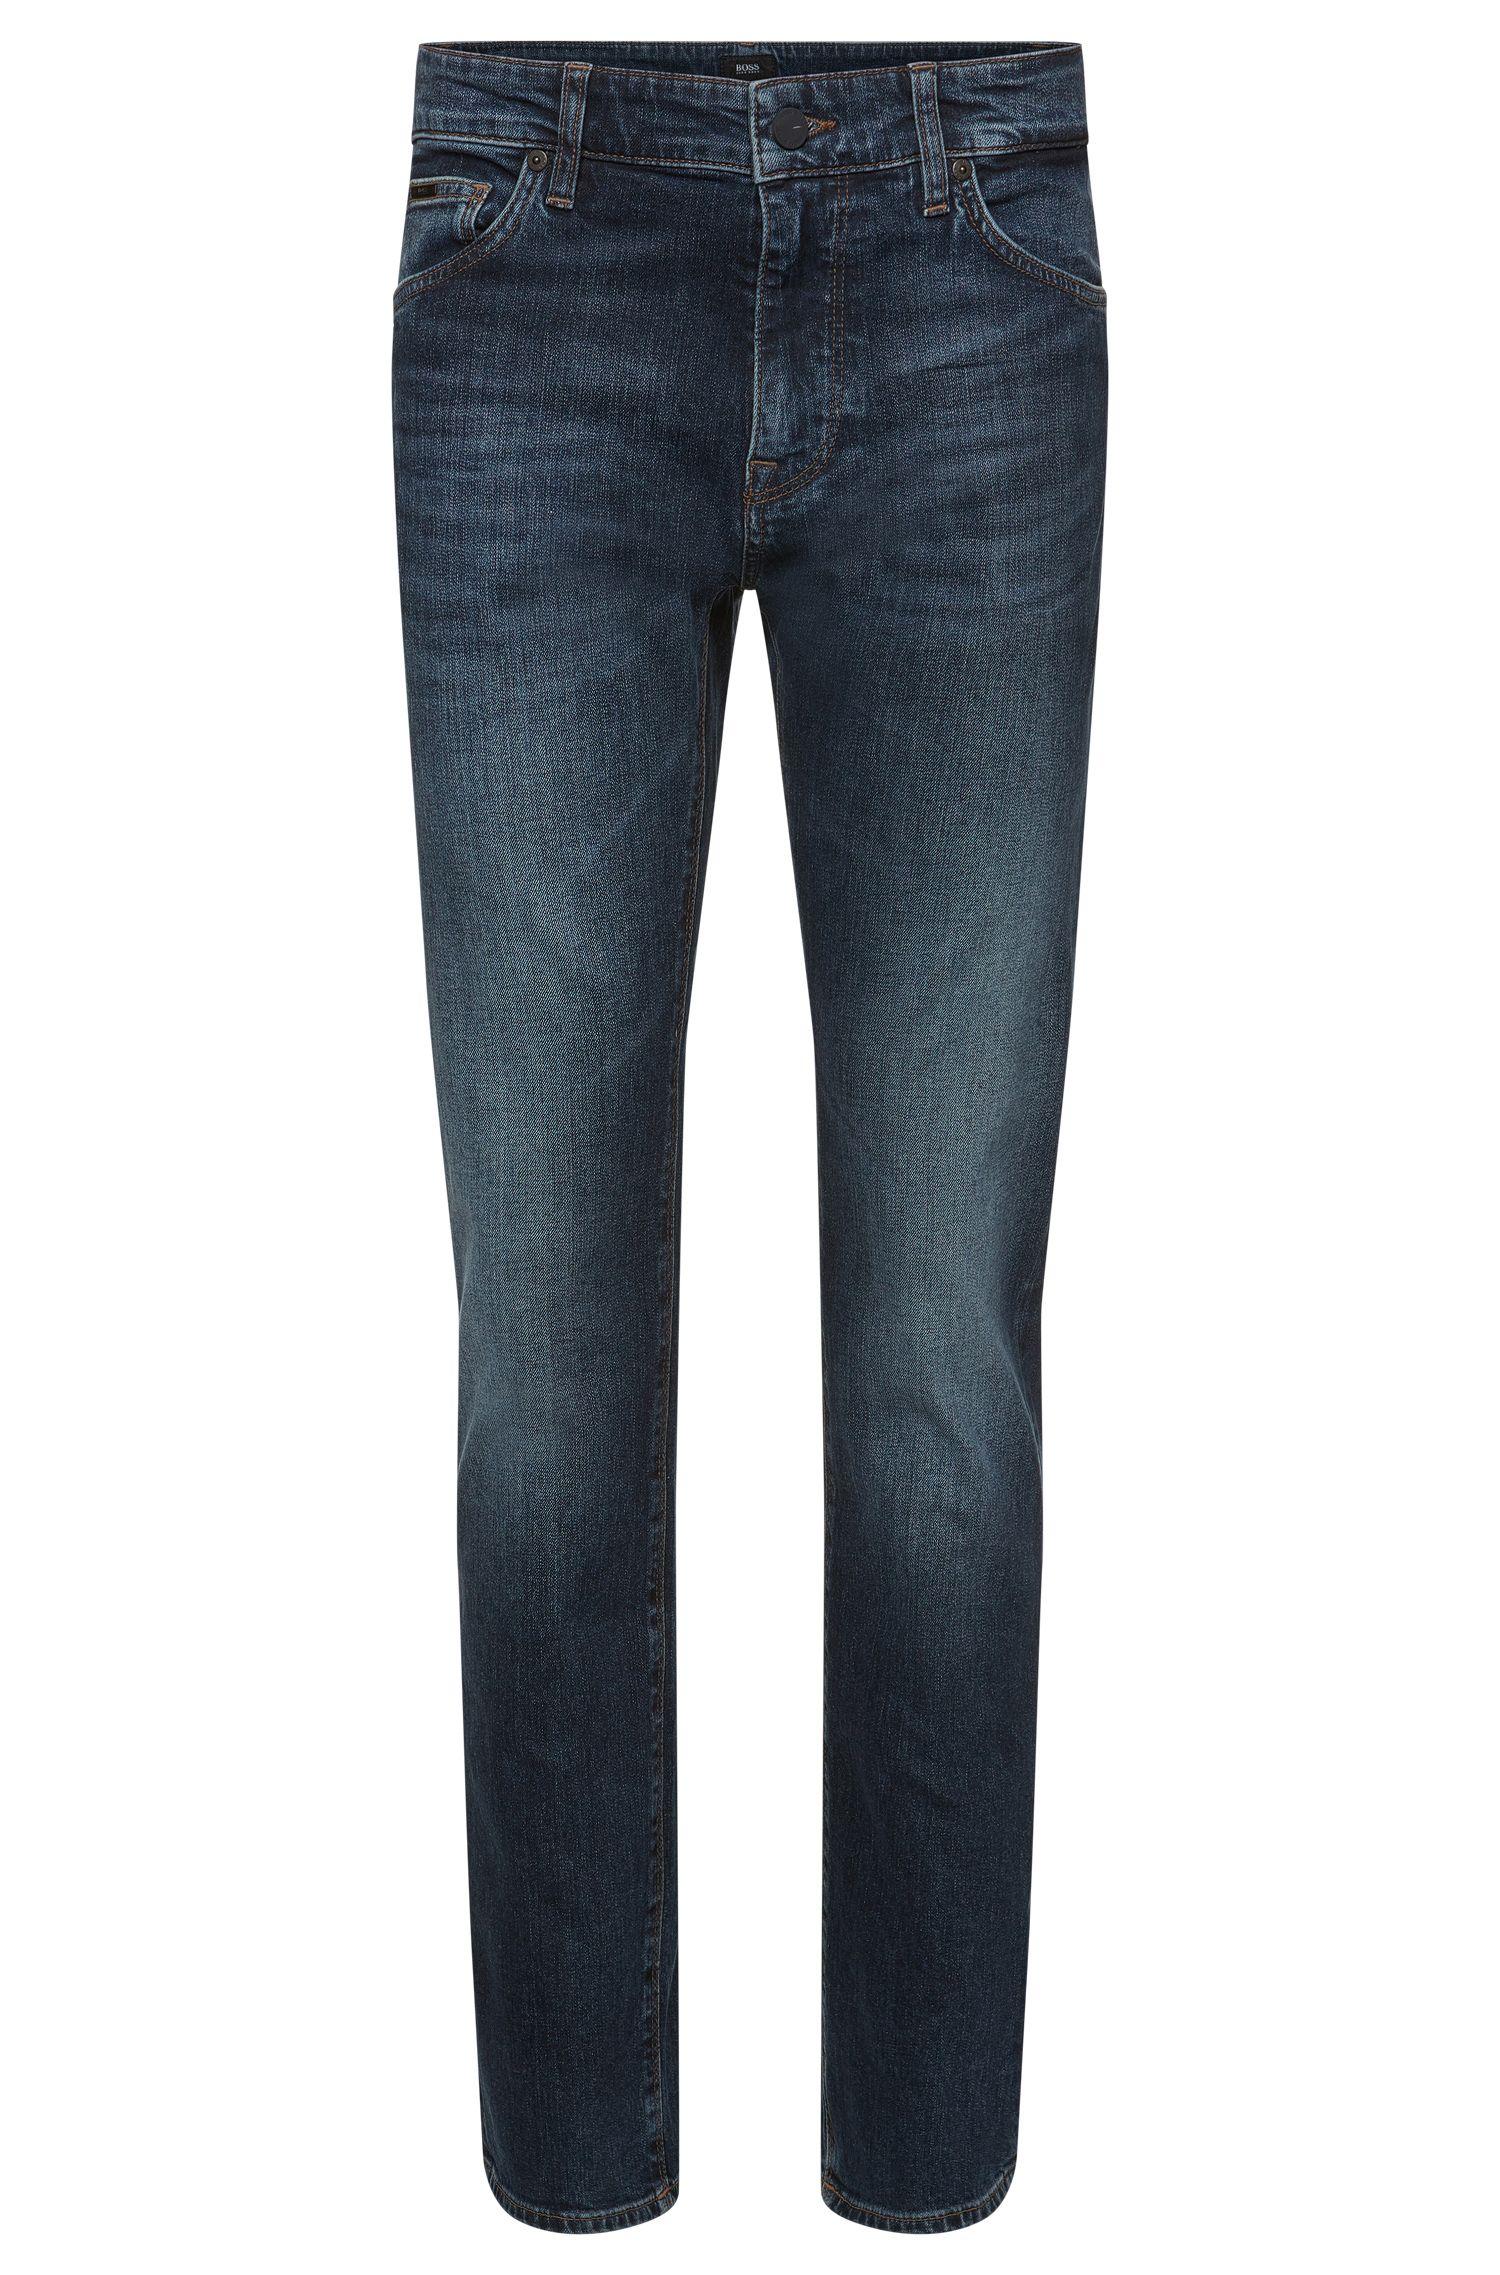 11 oz Stretch Cotton Jeans, Regular Fit   Maine